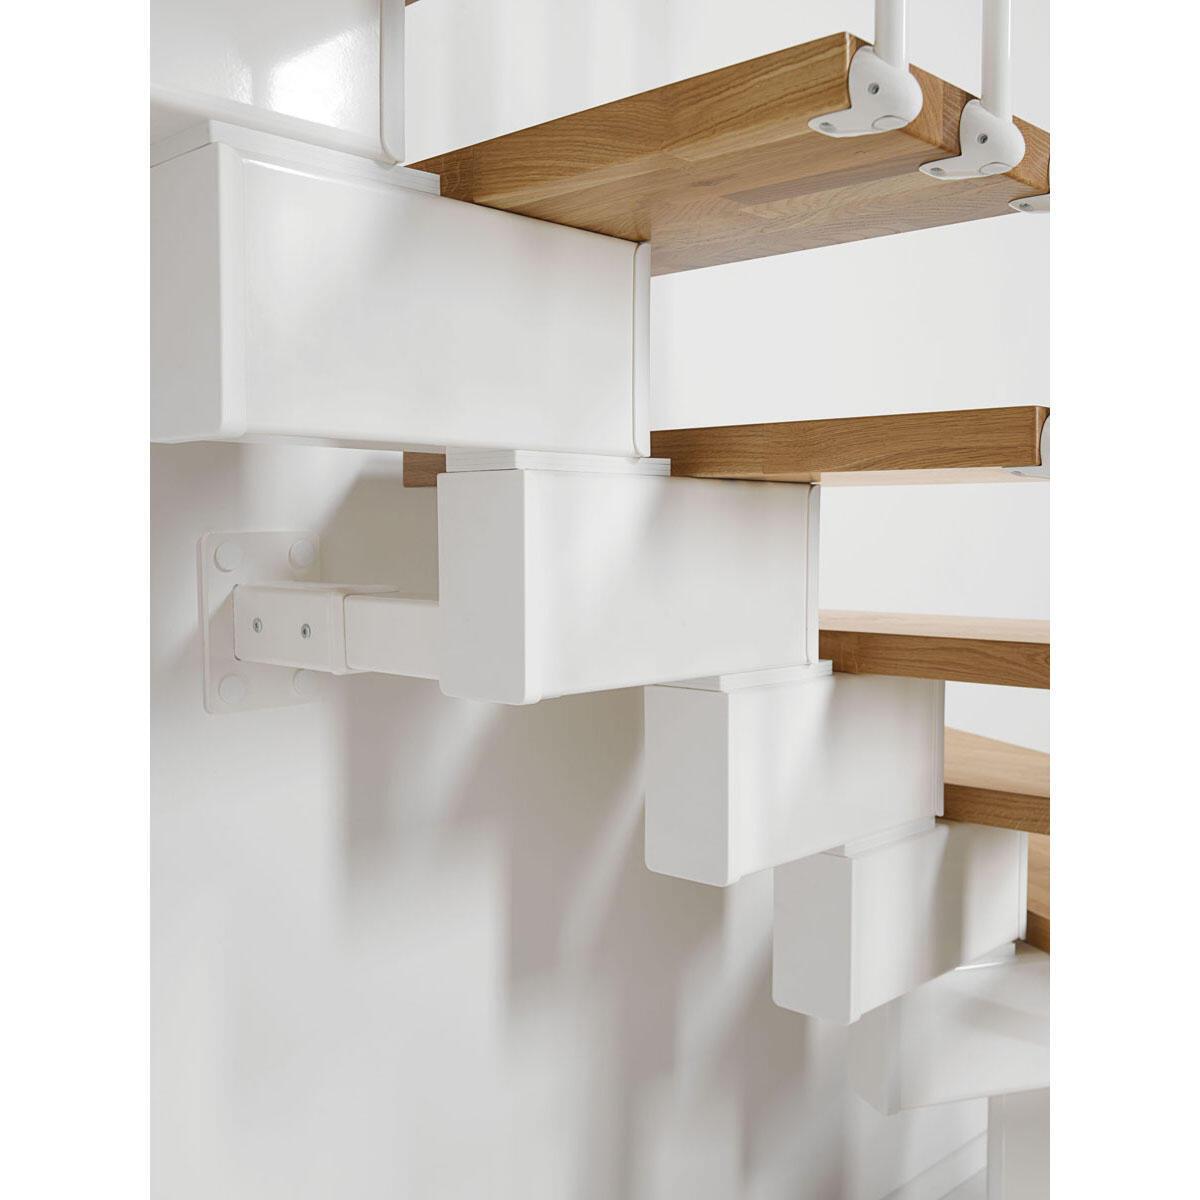 Scala a rampa due quarti di giro OAK90 FONTANOT L 70 cm, gradino rovere, struttura bianco - 4